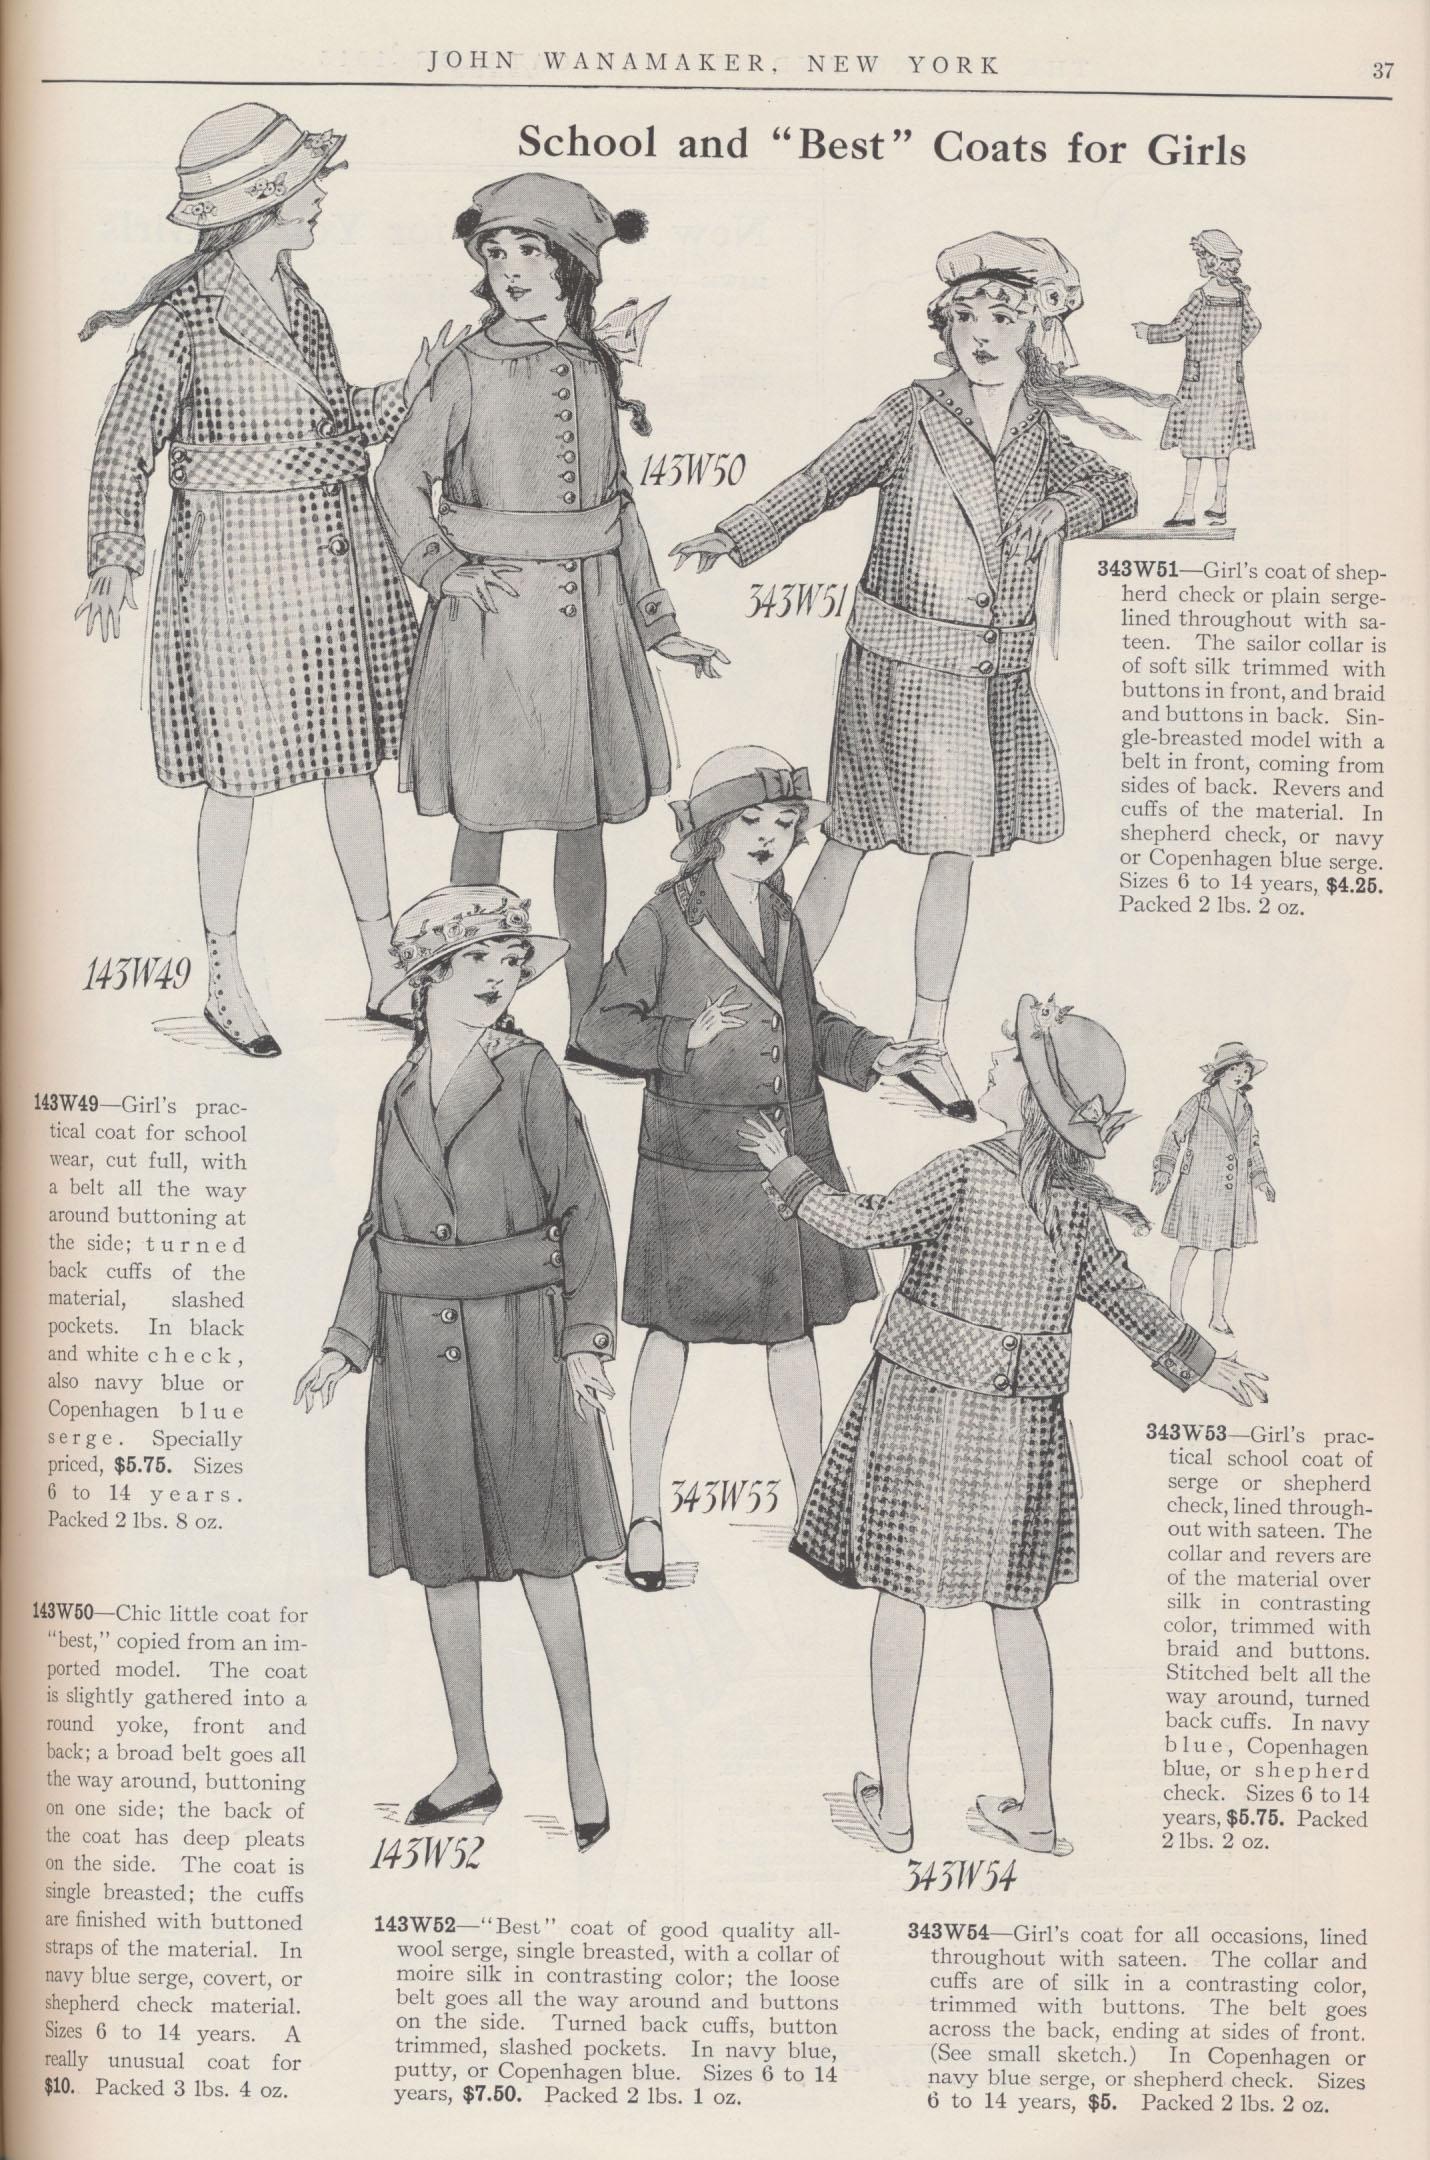 Girls' coats